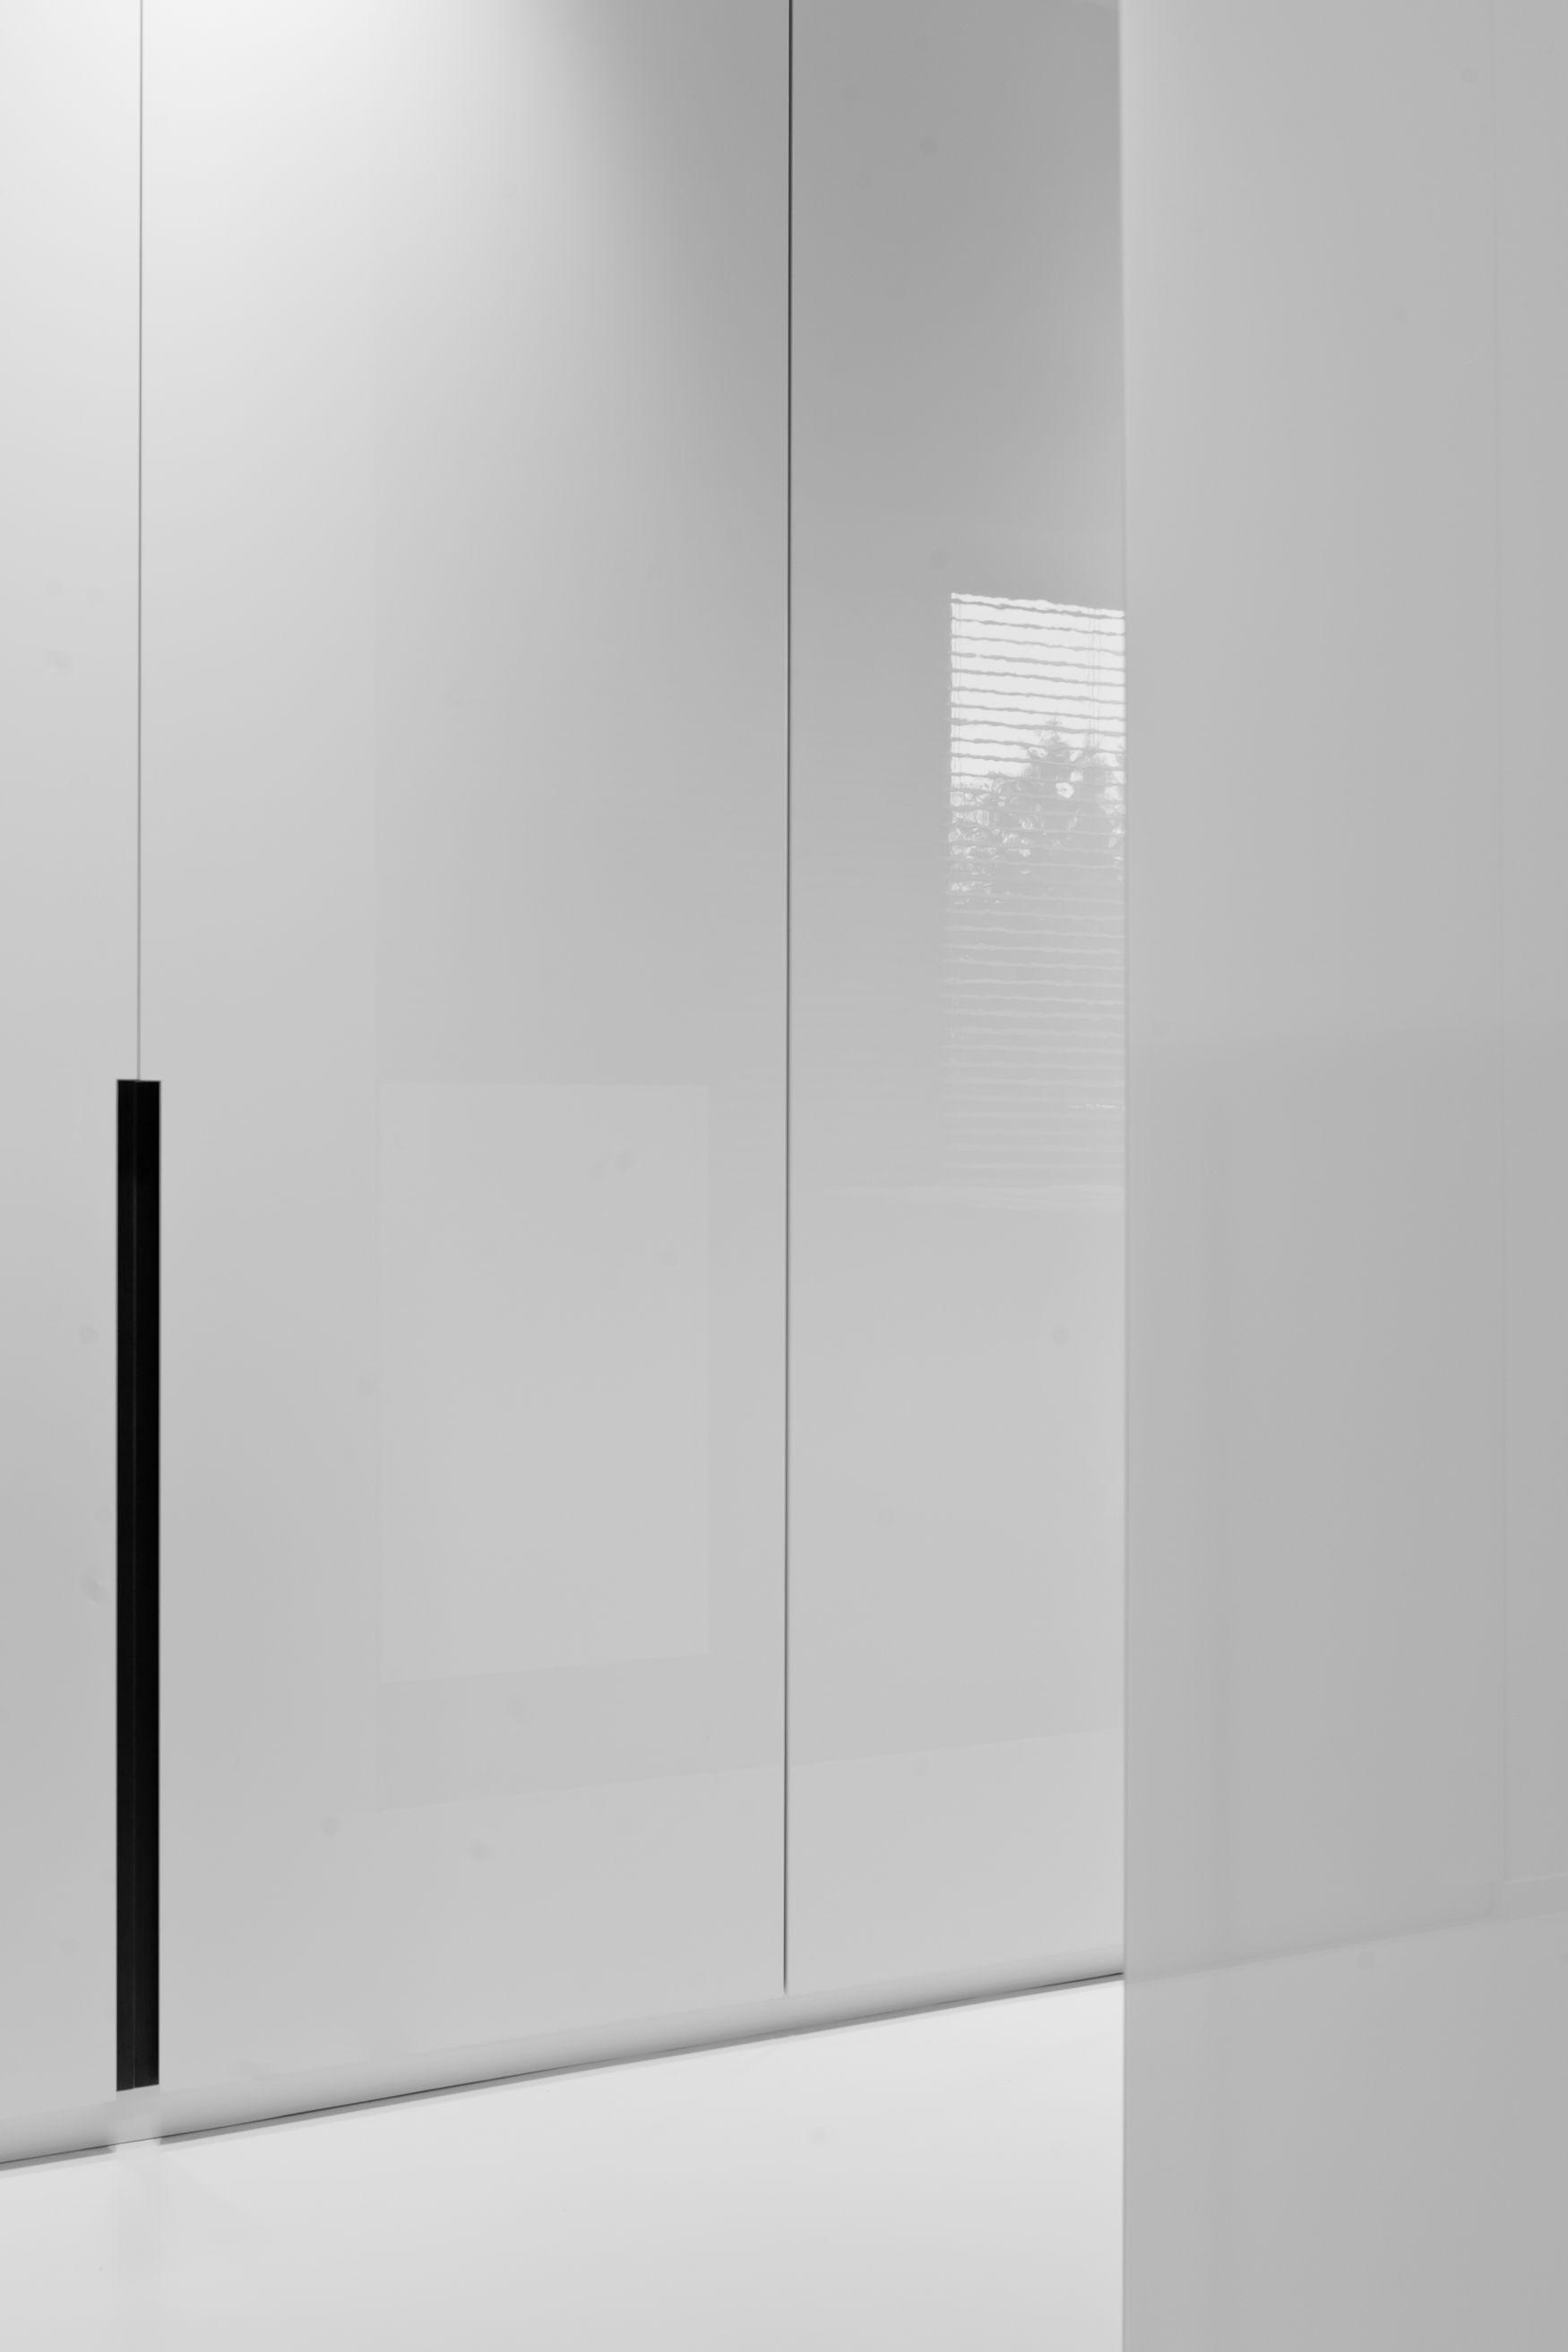 Pax Wardrobe With Sliding Doors 78 3 4x25 3 4x93 1 8 Ikea Sliding Door Sliding Wardrobe Doors Ikea Bedroom Furniture